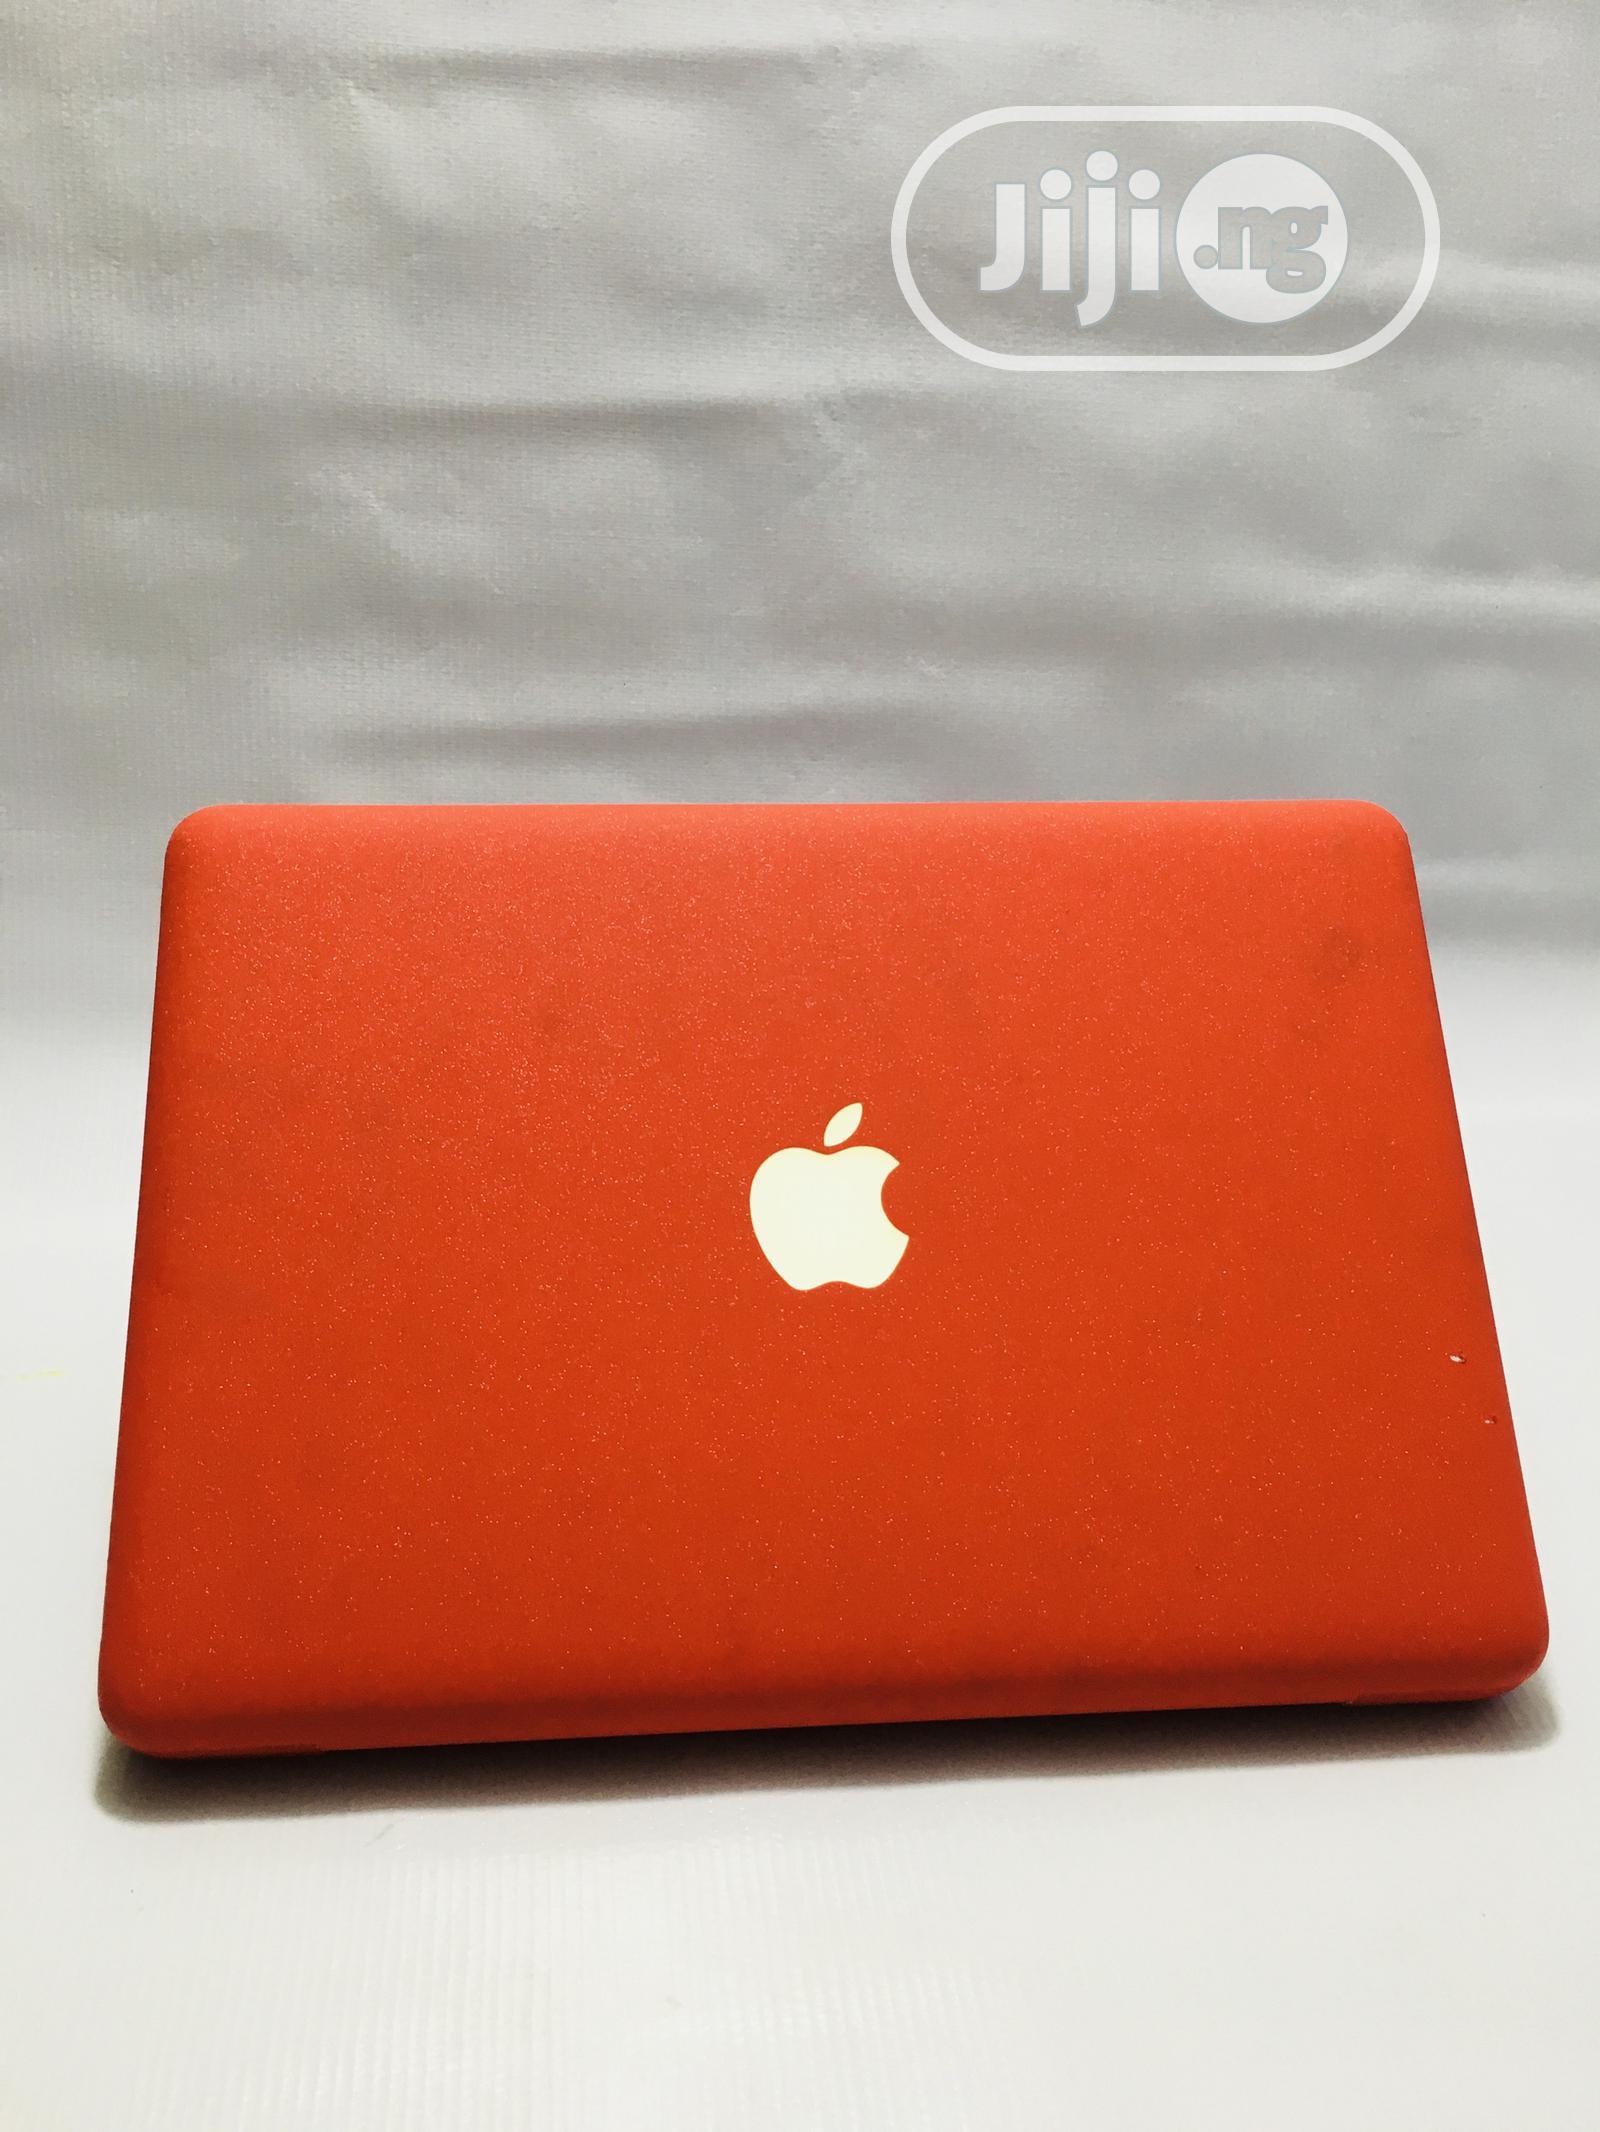 Archive: Laptop Apple MacBook 4GB Intel Core 2 Duo HDD 250GB